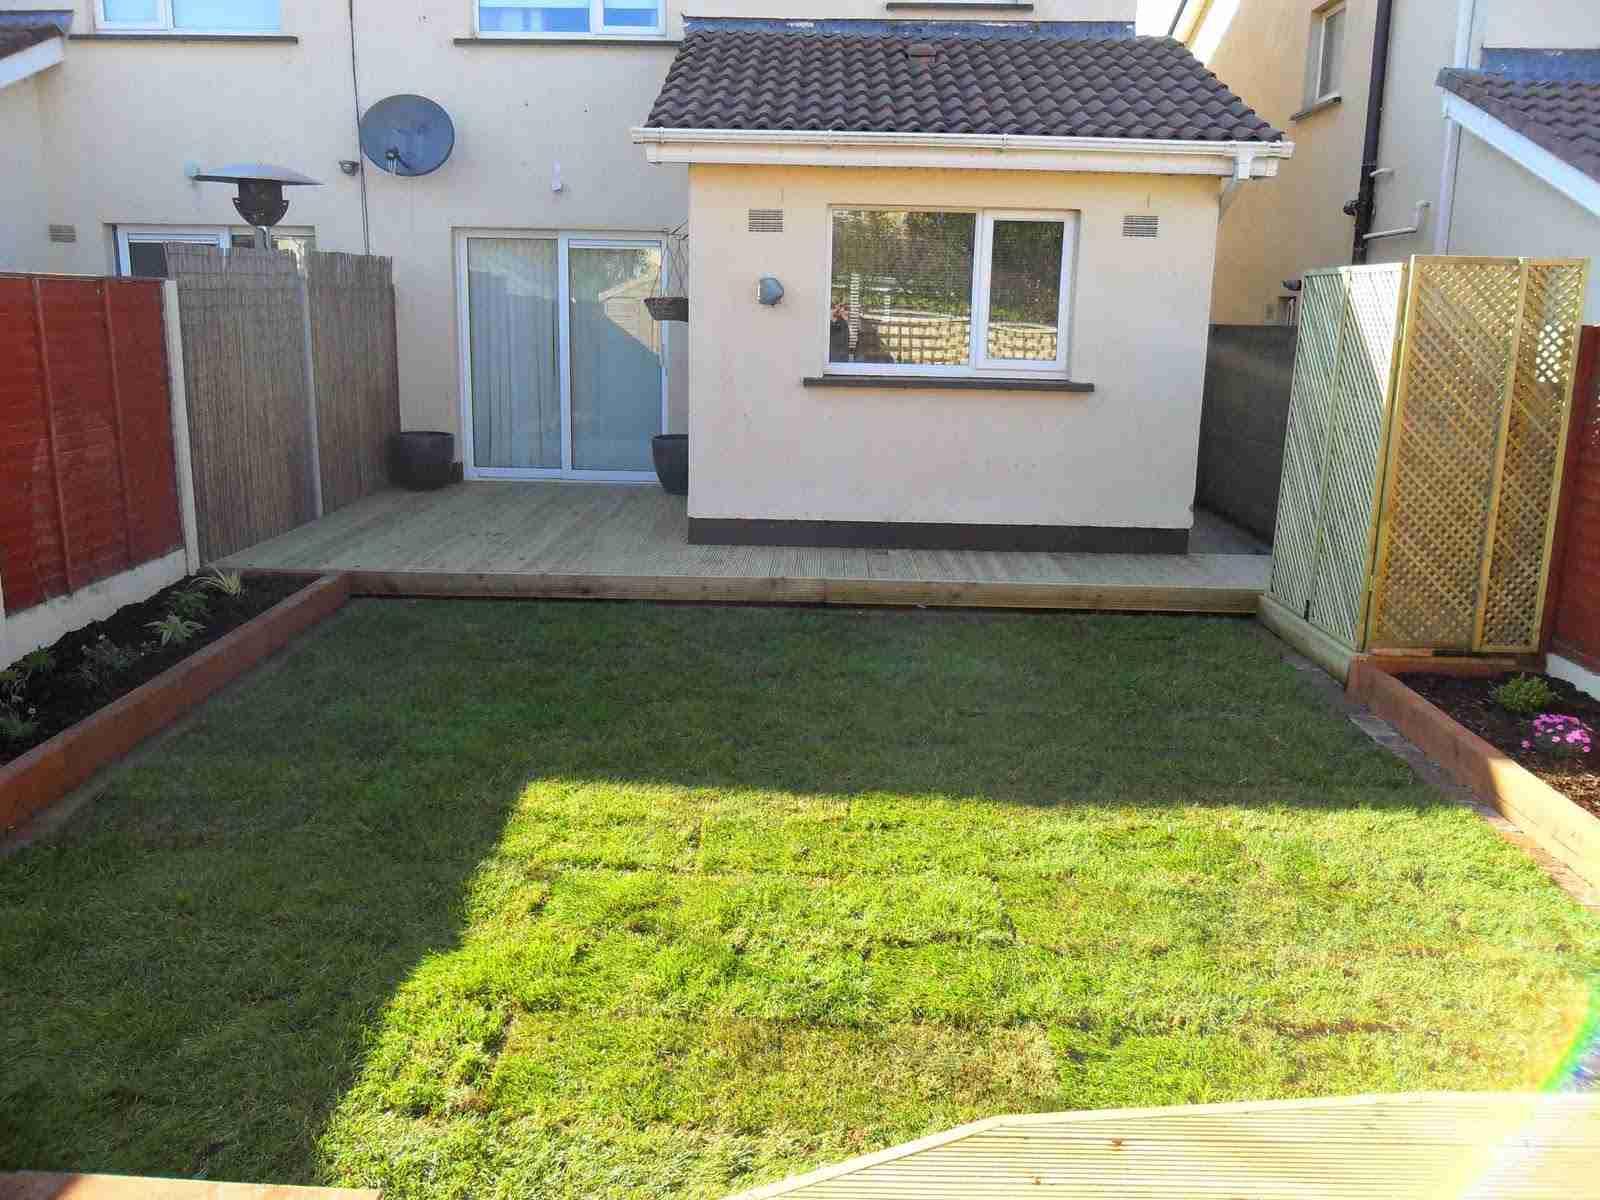 Landscaping a rear garden design makeover & decking, Inse ...